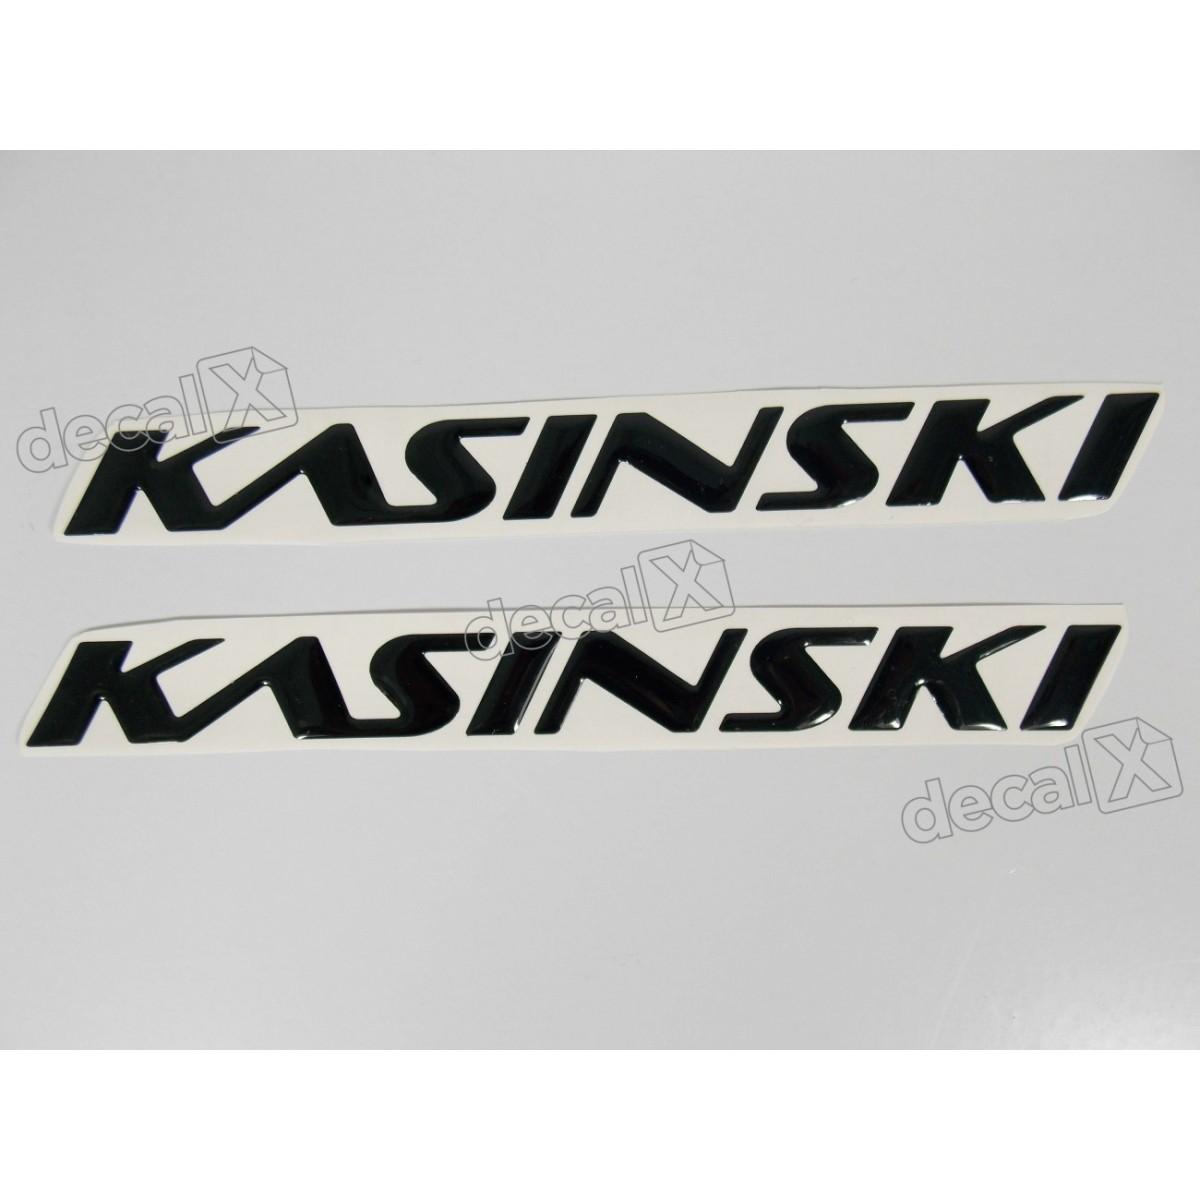 Par Adesivos Kasinski Resinado Preto 18x1,7 Cms Rs9 - Decalx